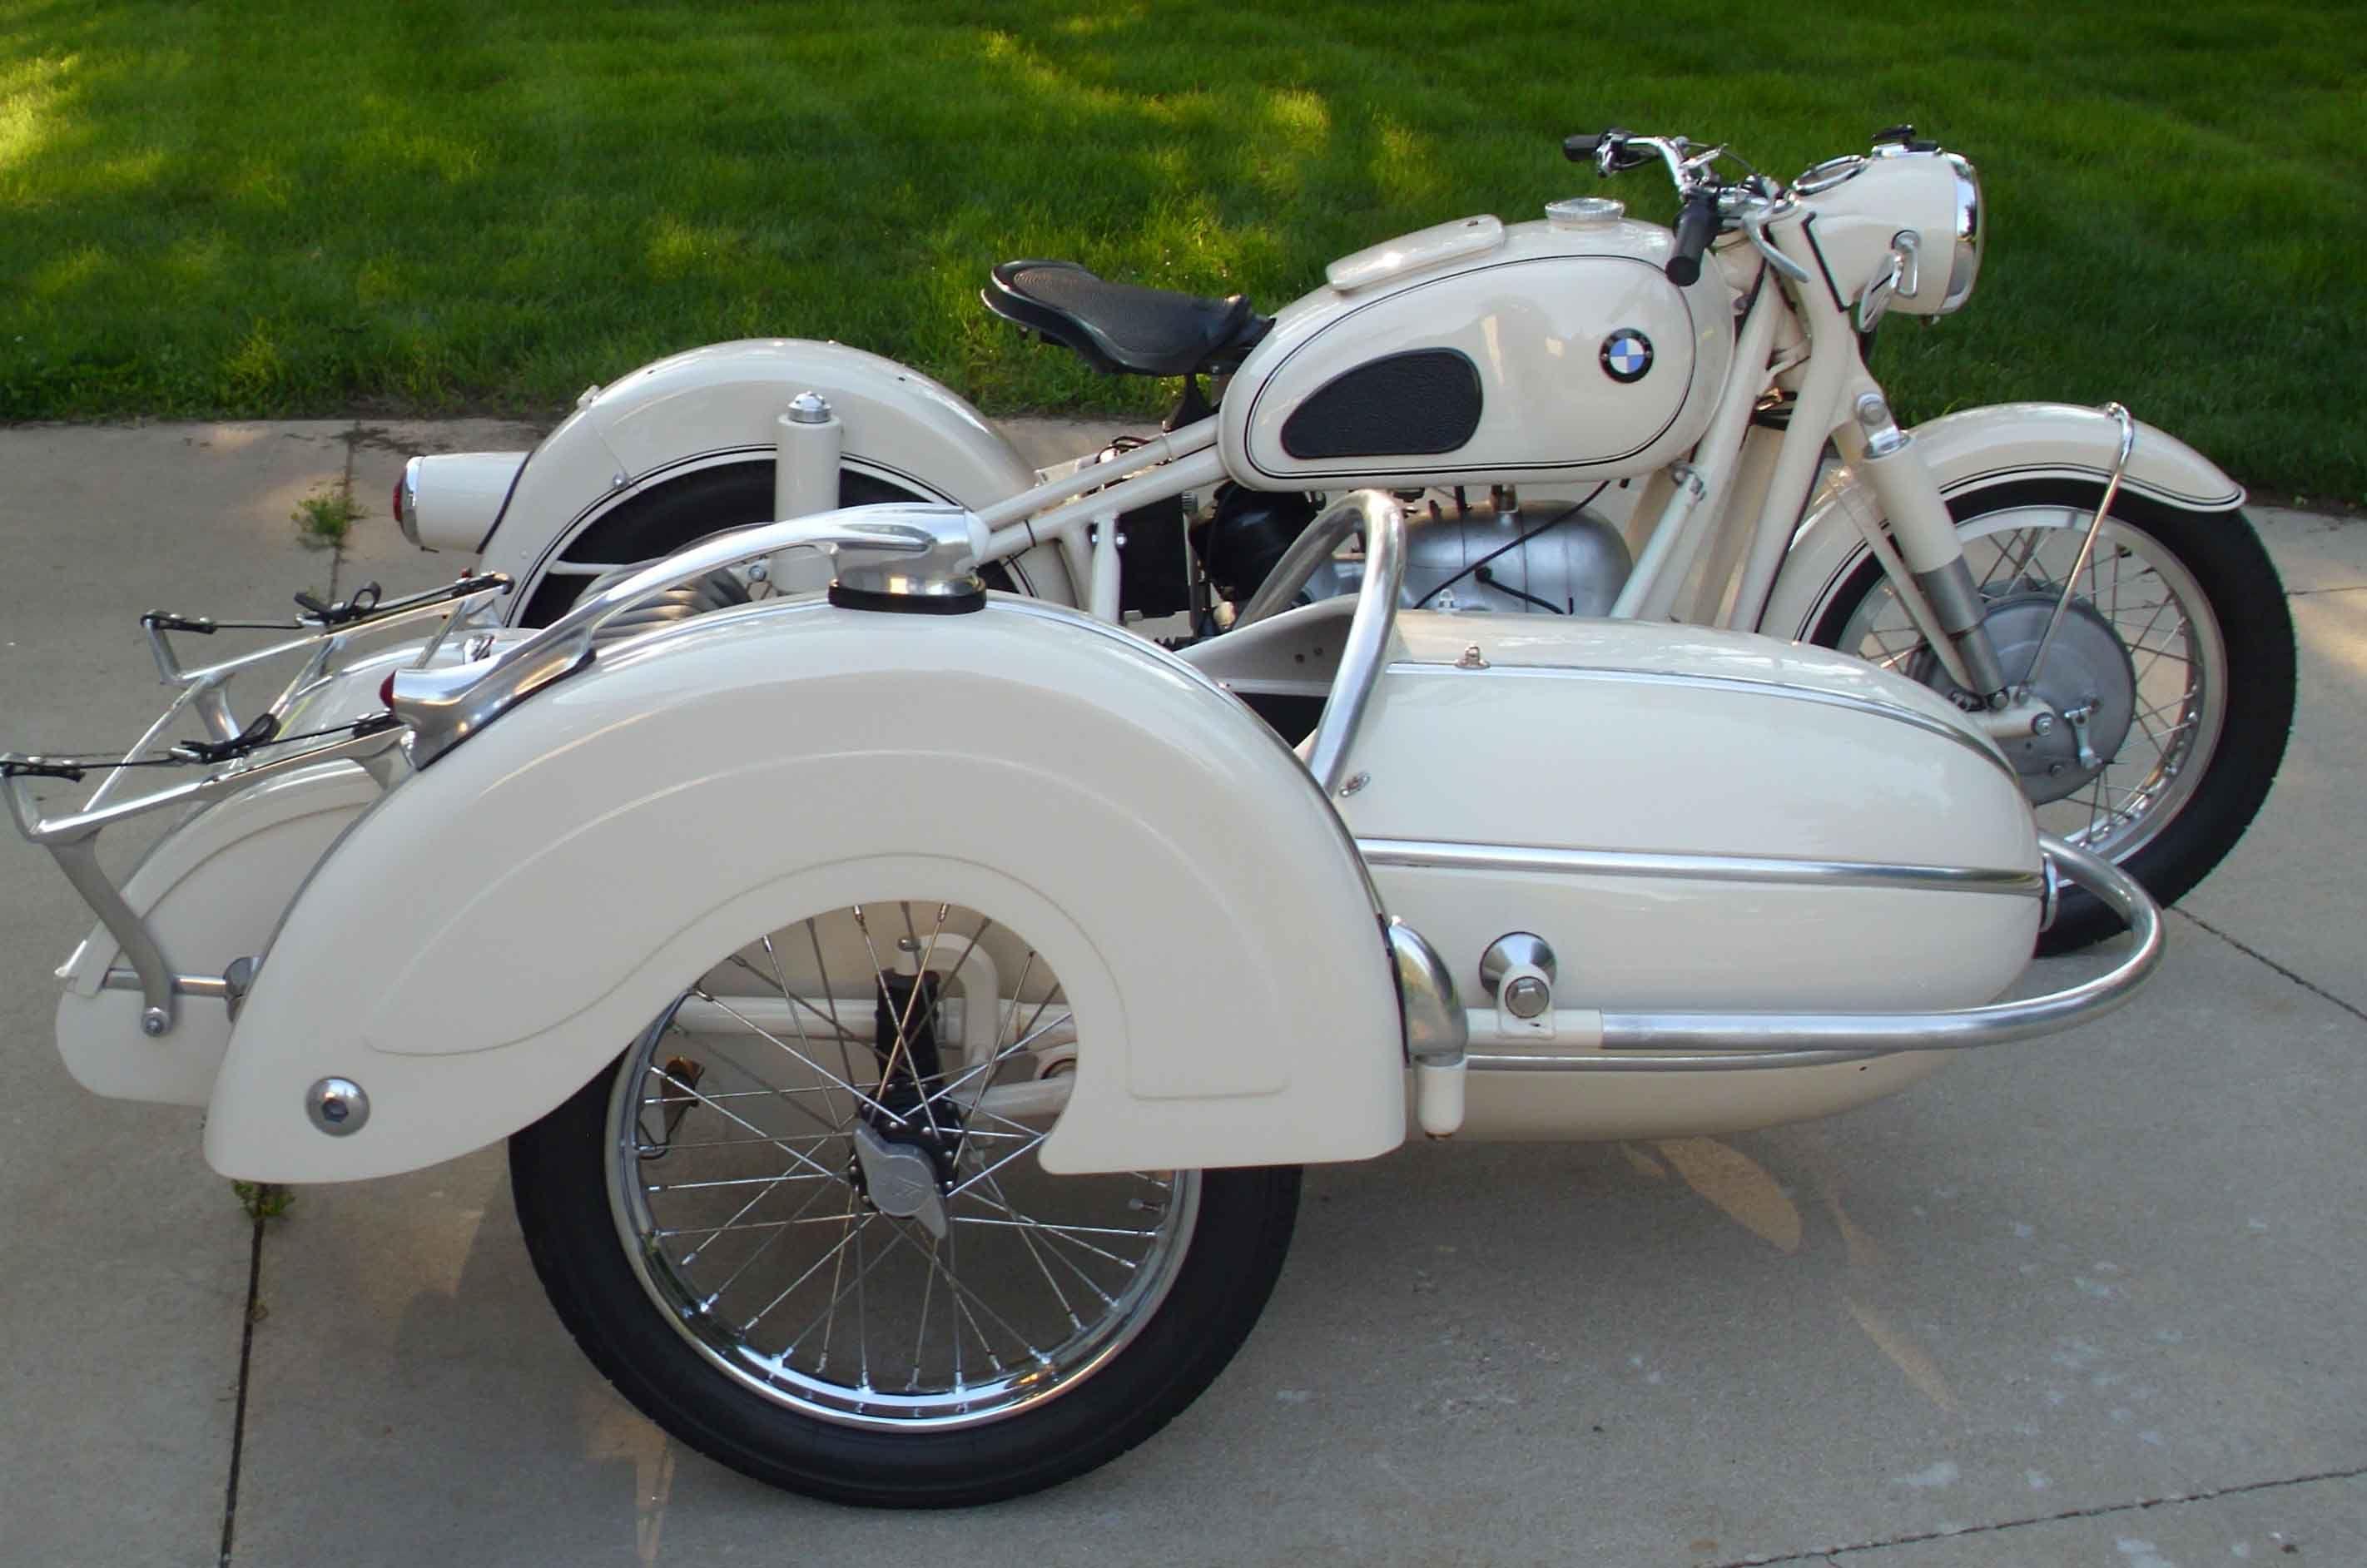 1966 bmw r60/2 with steib s 500 sidecar | no harleys | pinterest